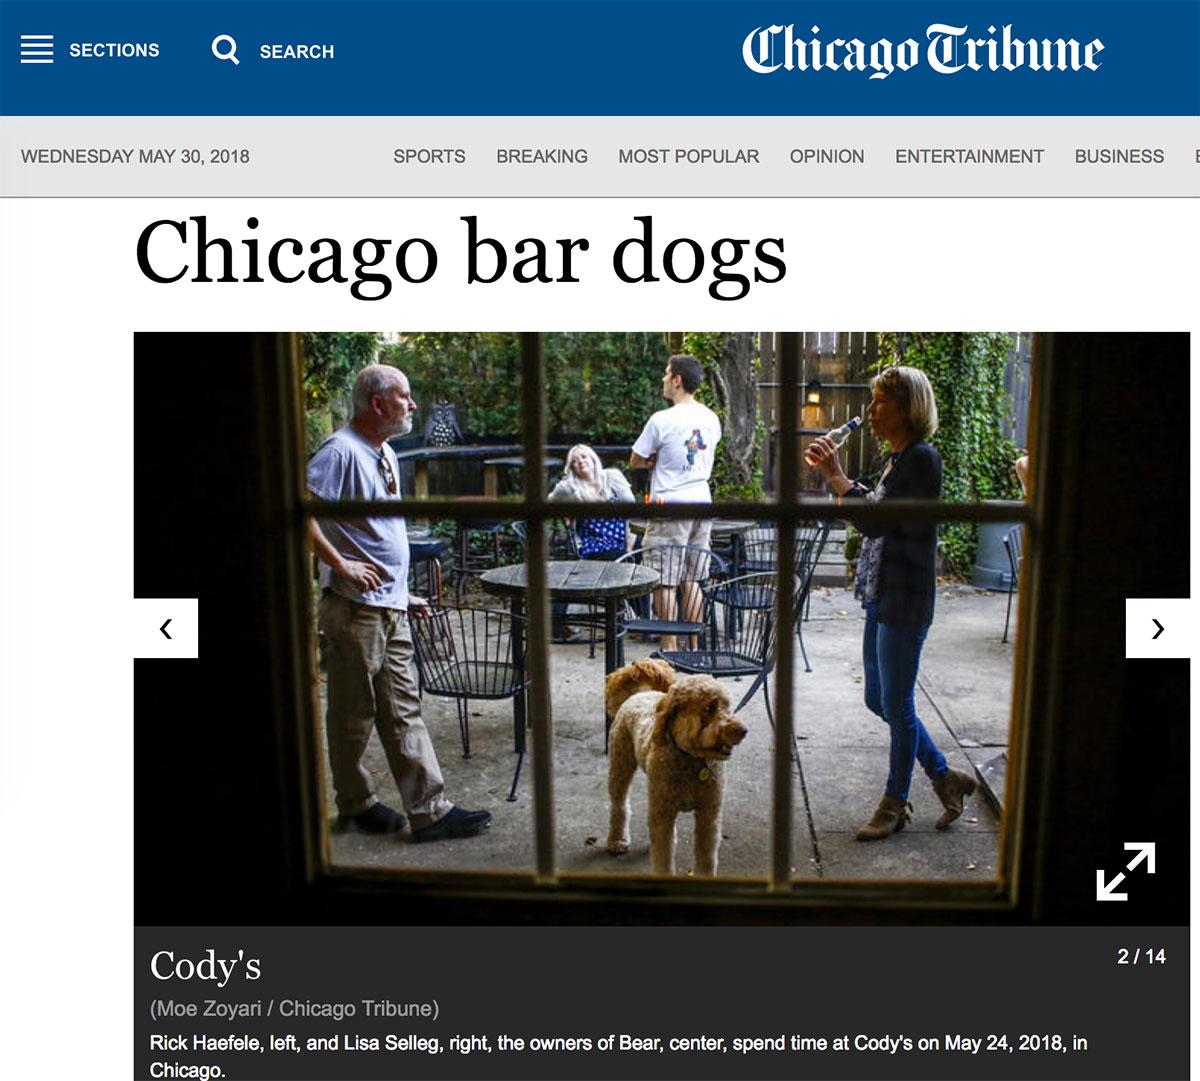 Moe_Zoyari_Chicago_Tribune_03.jpg